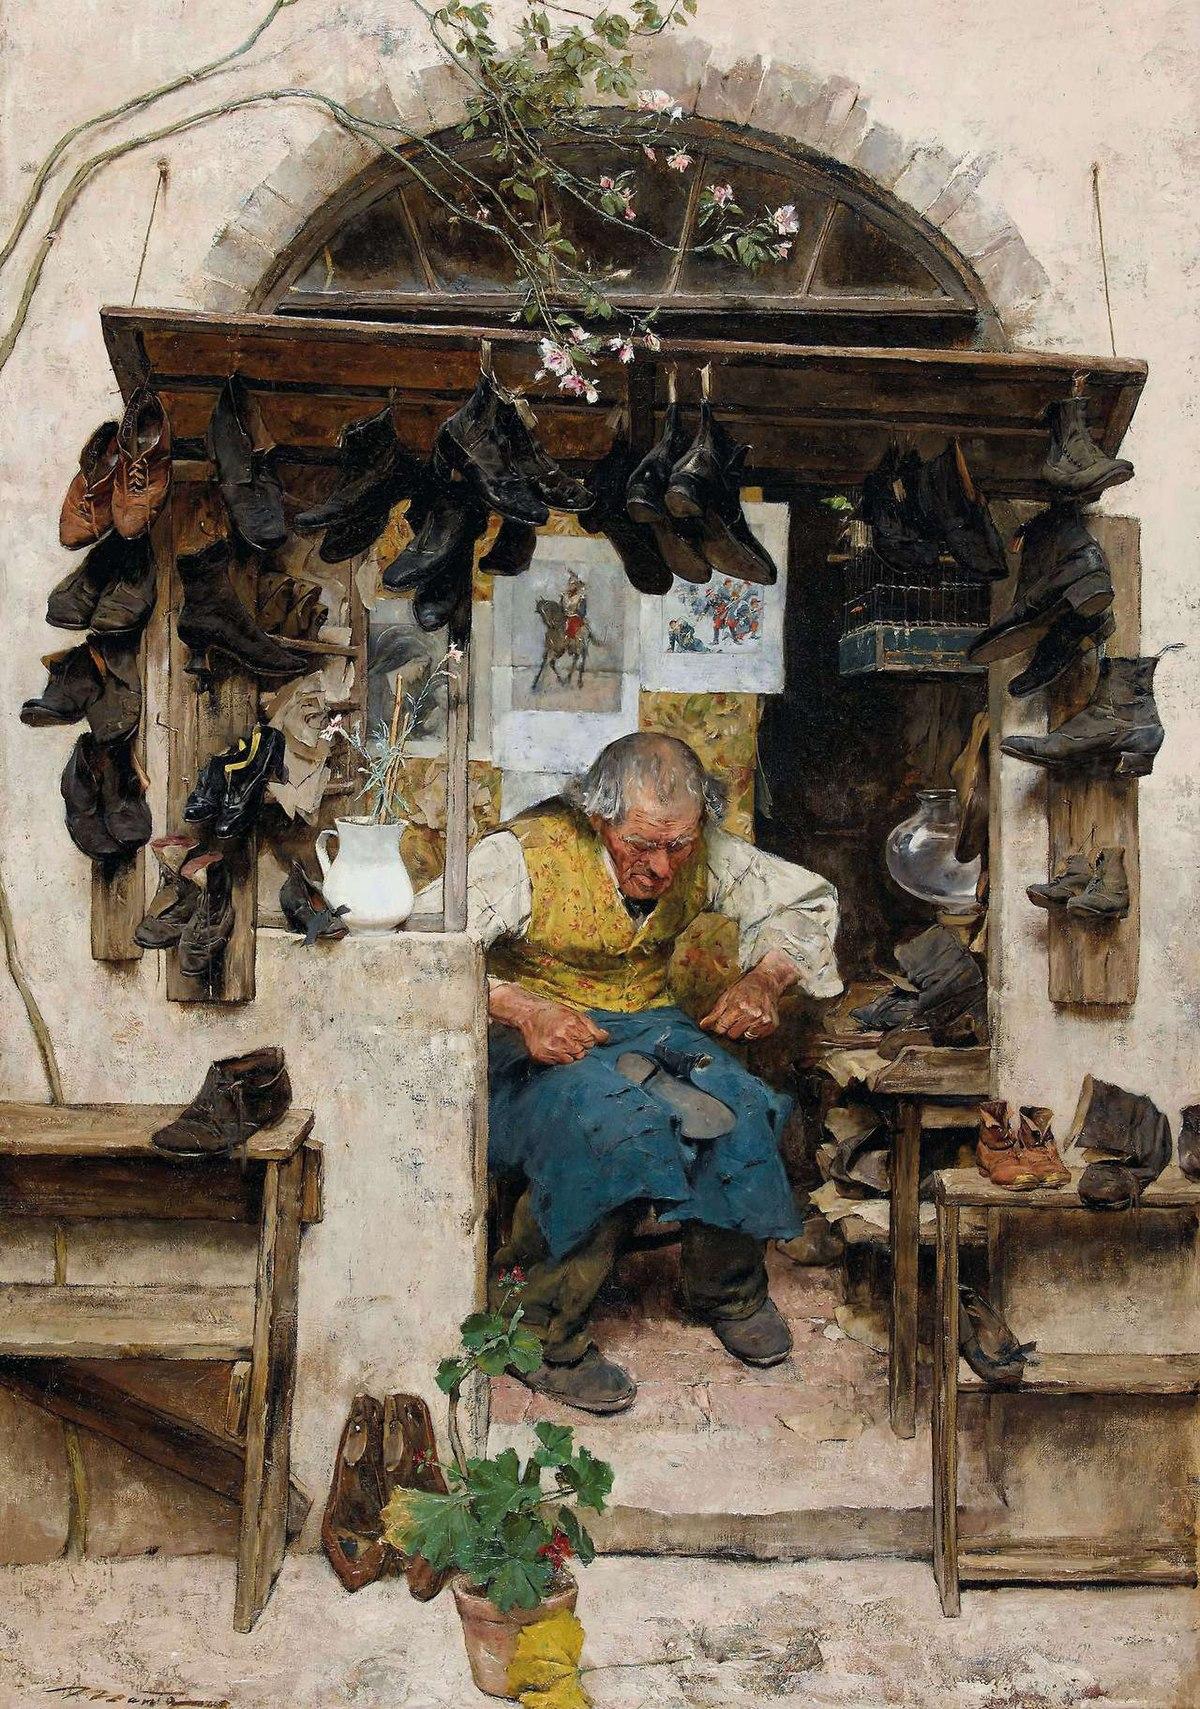 File:Mentha, Old shoemaker.jpg - Wikimedia Commons